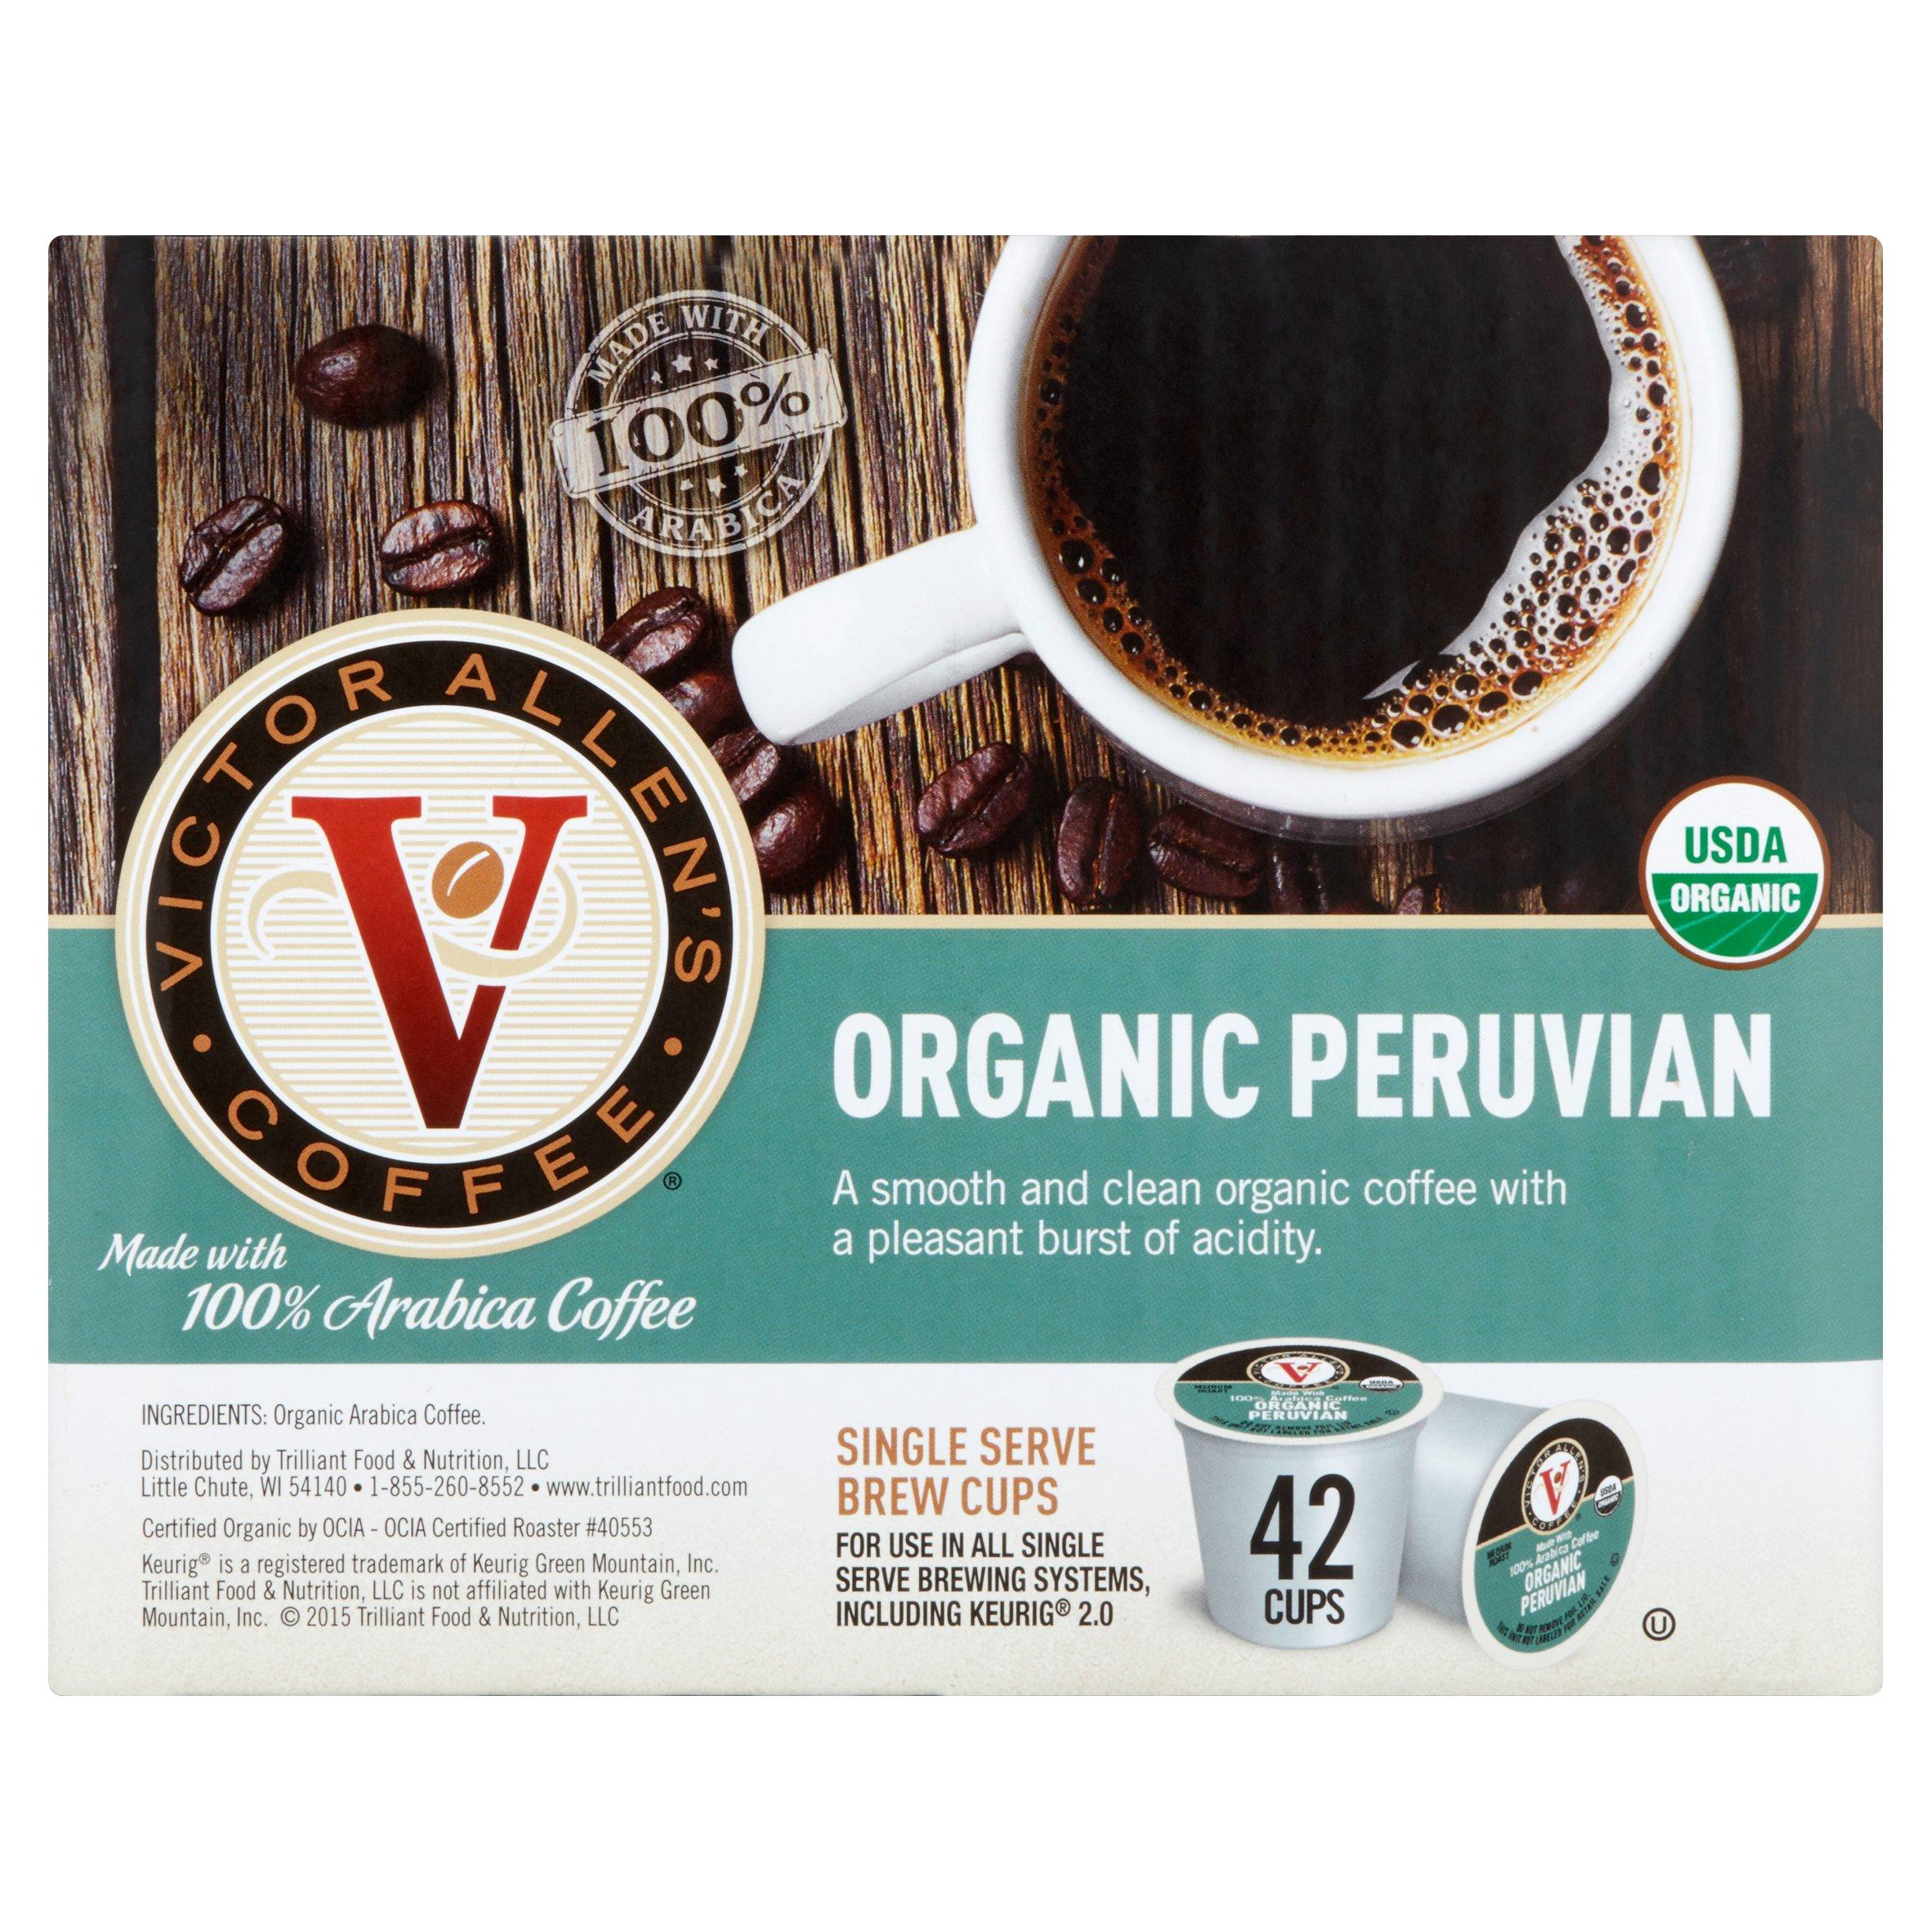 Victor Allen's Coffee Medium Roast Organic Peruvian Single Serve Brew Cups, 0.35 oz, 42 count